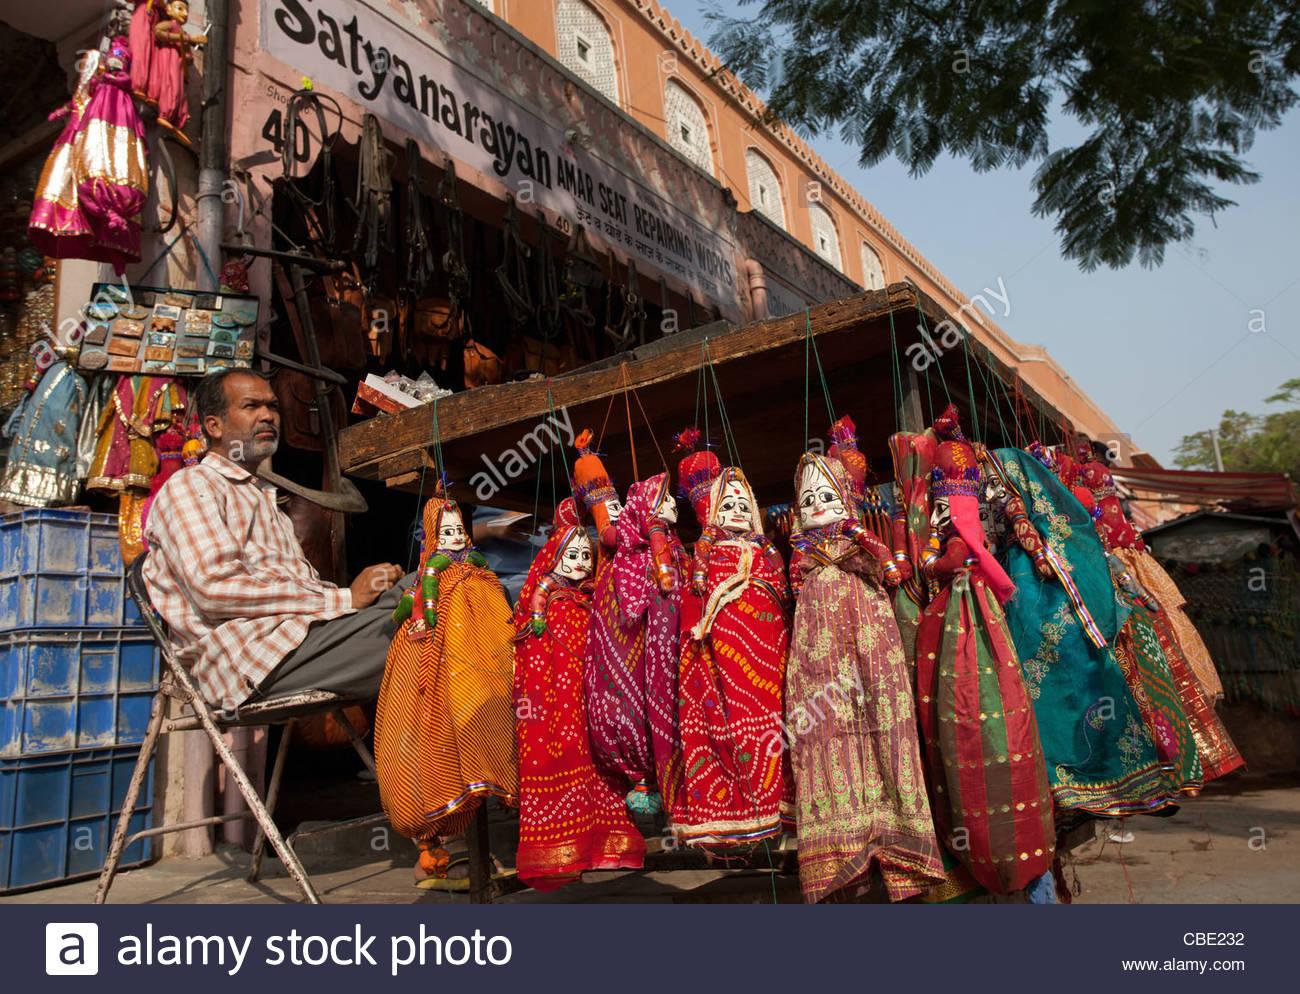 A street vendor sells puppets on the street near Hawa Mahal, Jaipur, Rajasthan, India. - Stock Image